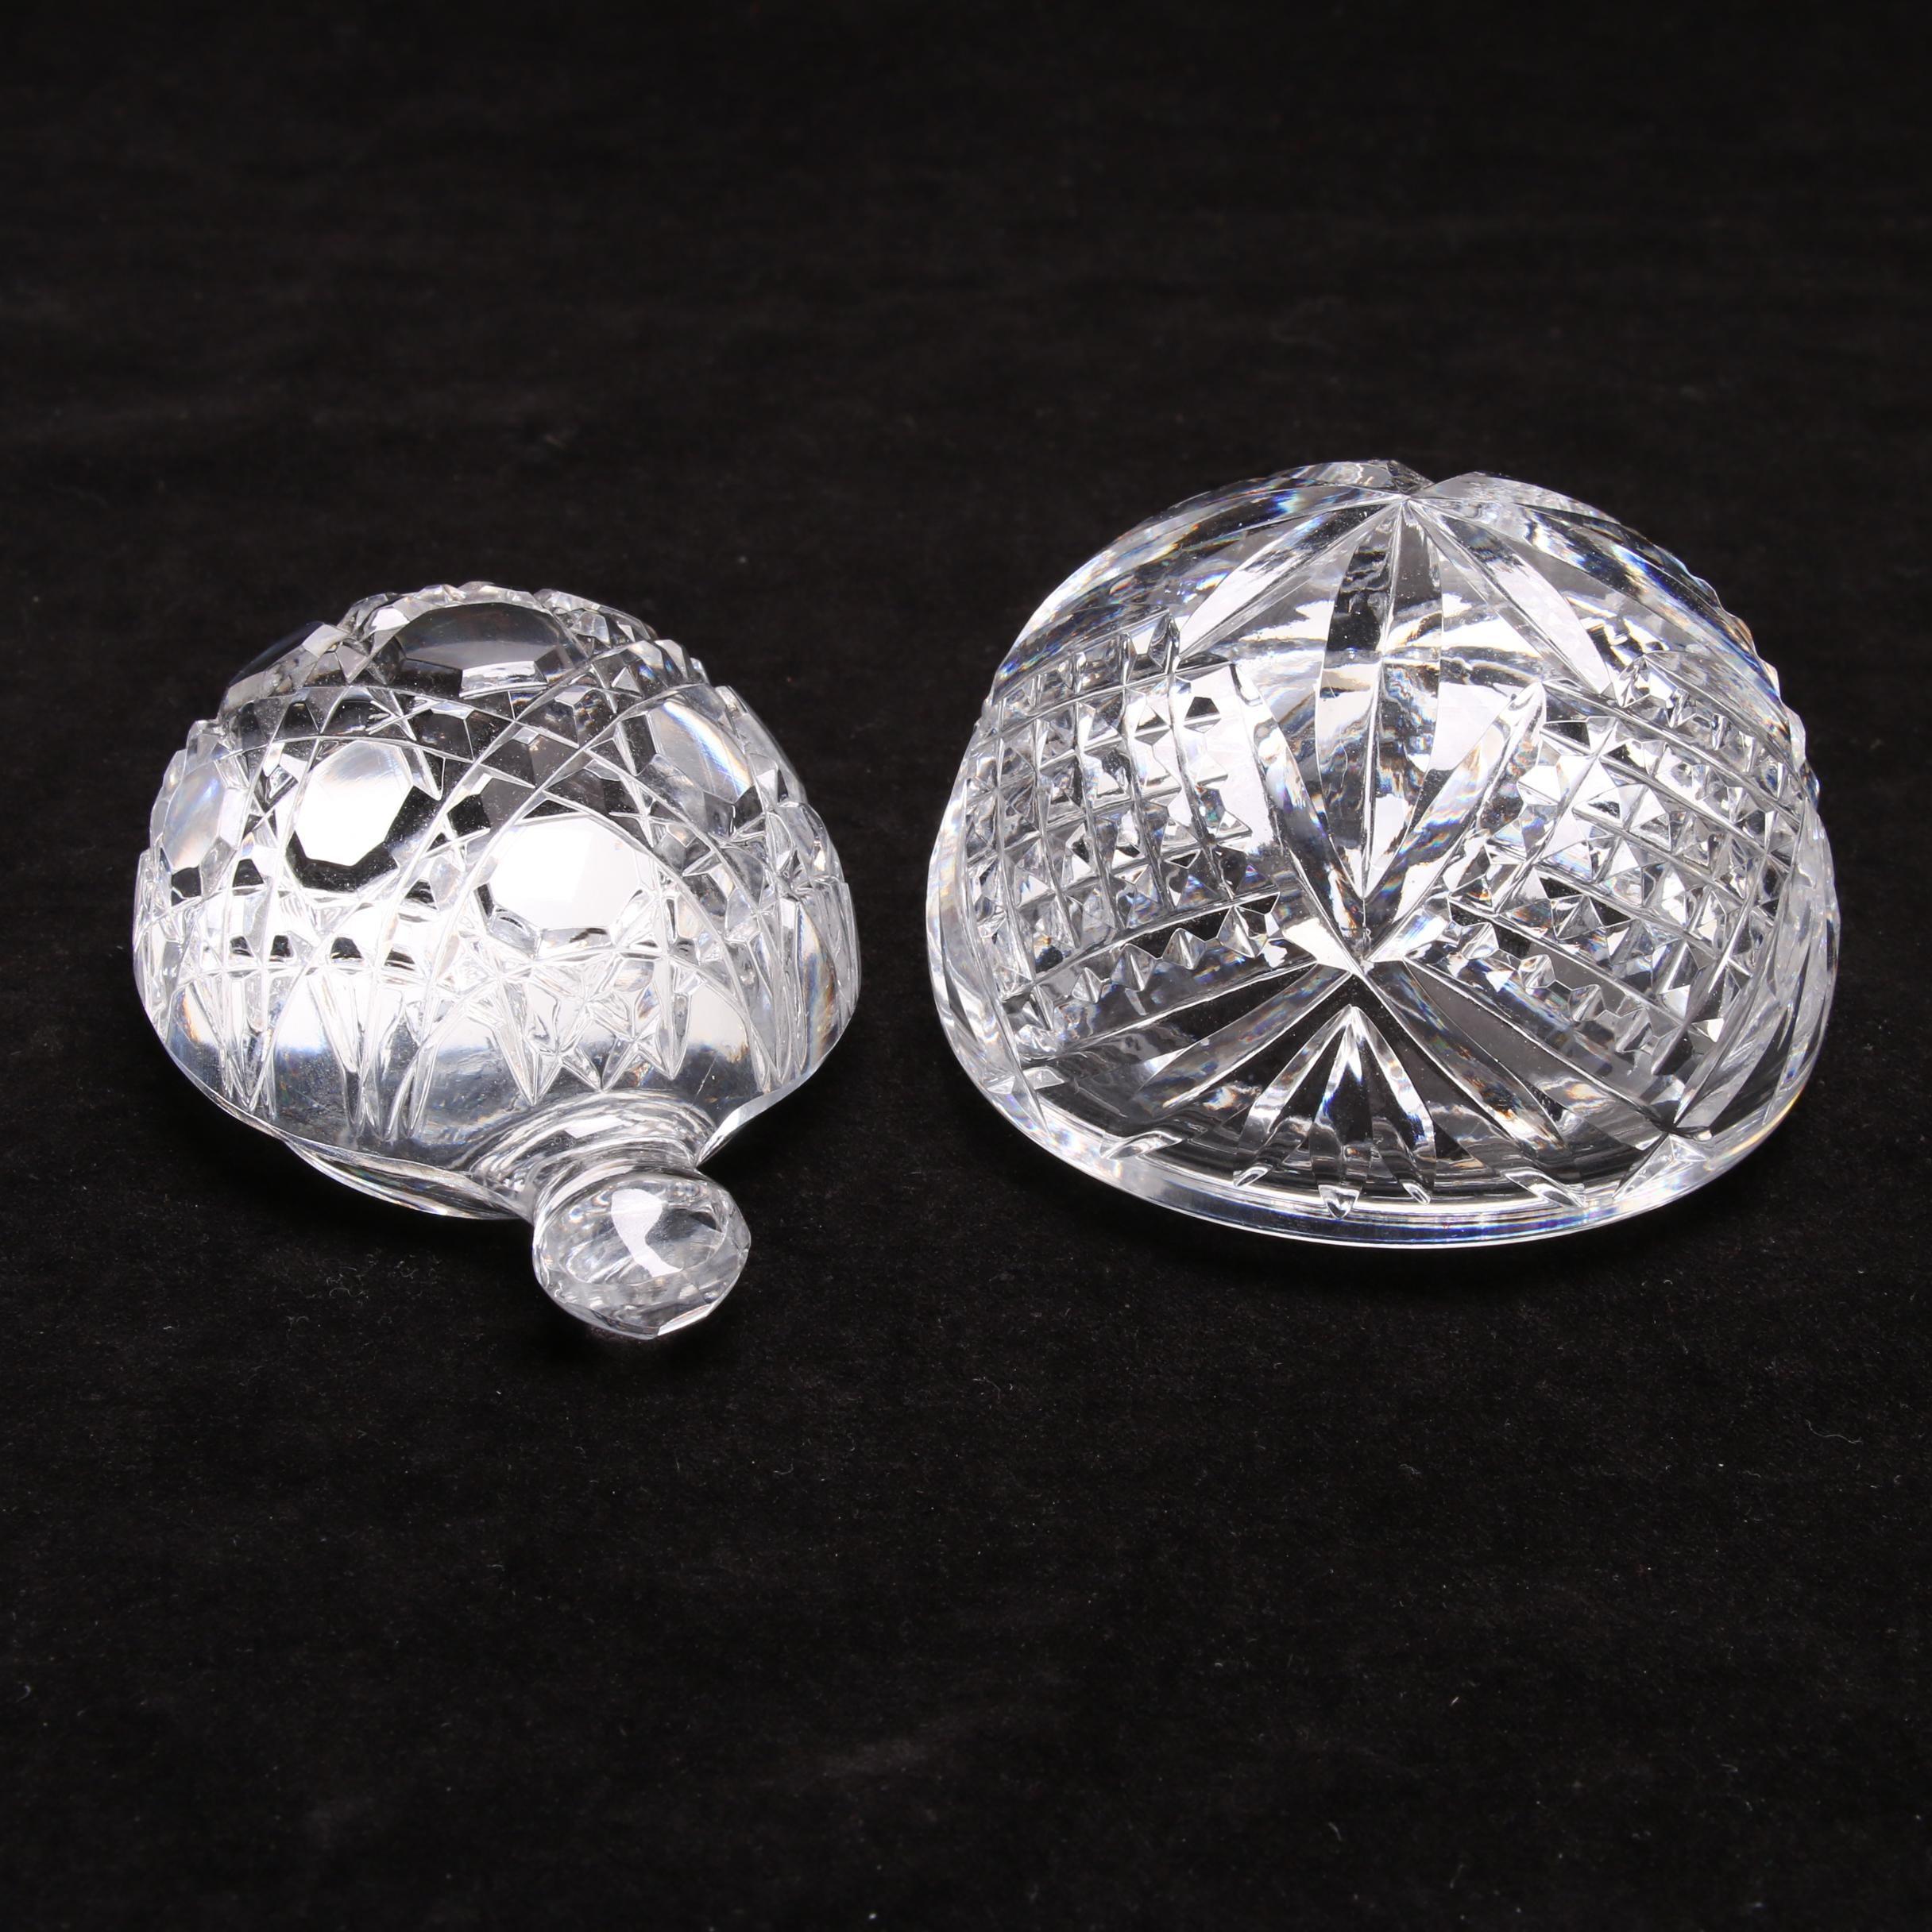 Pair of Waterford Crystal Paperweights